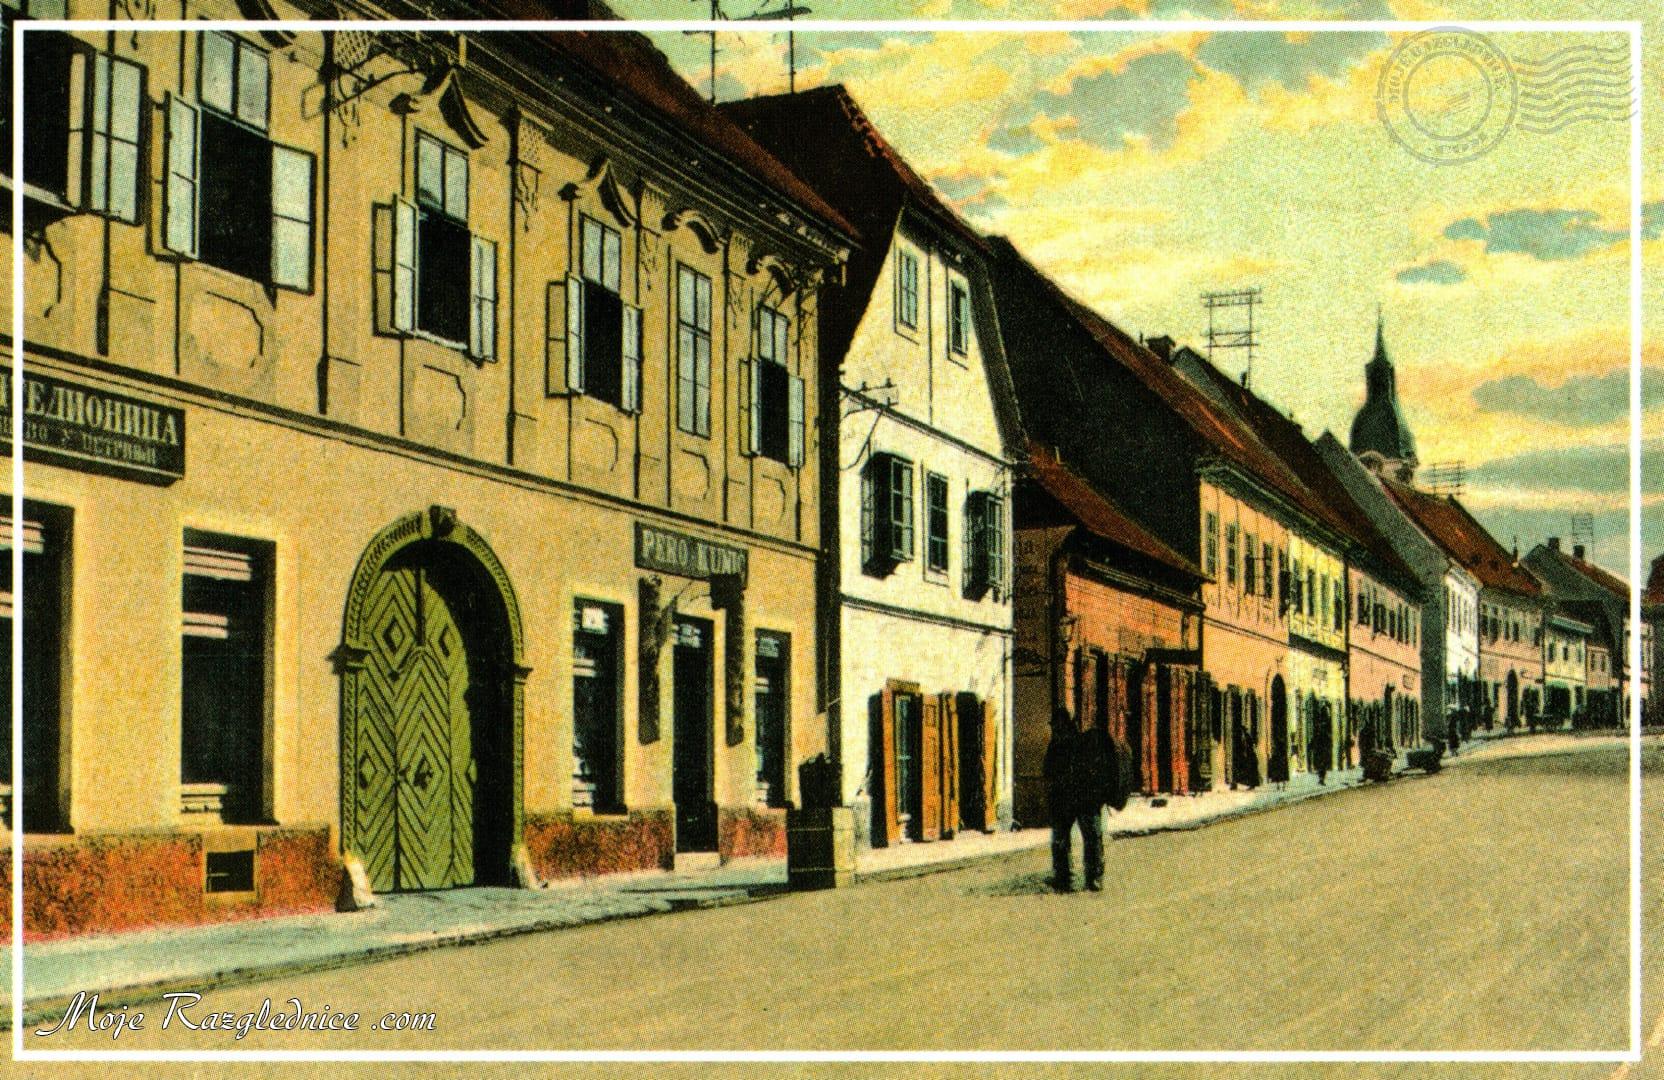 Stare Razglednice - Suvenir - Petrinja, Croati